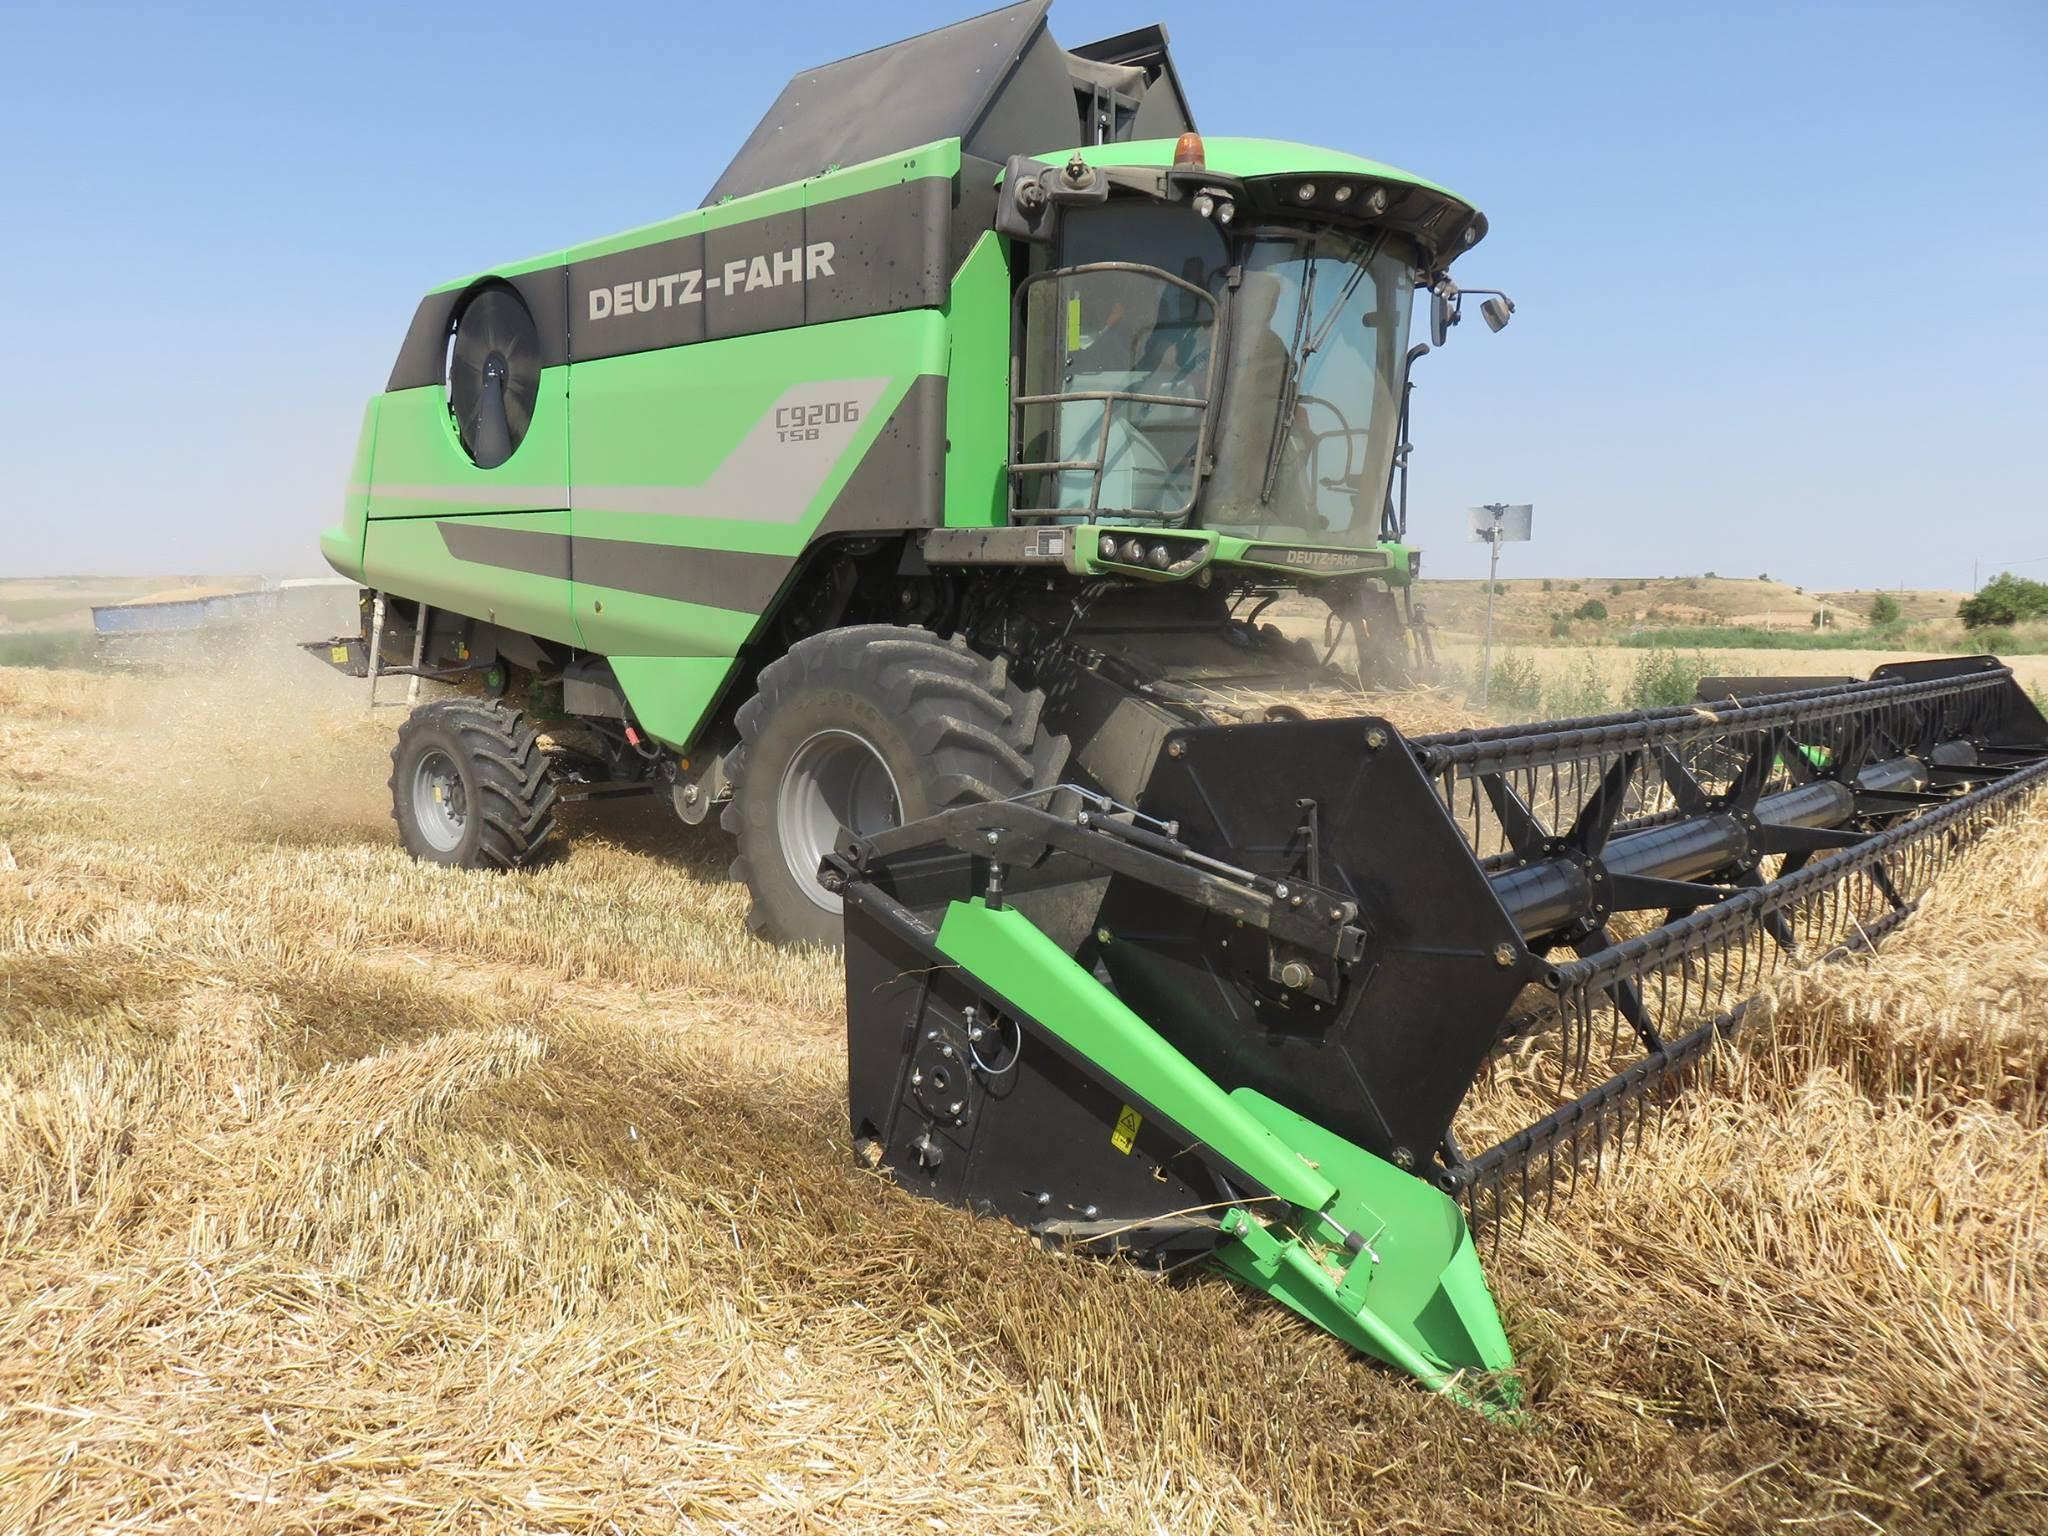 cosechadora-Deuzt-Fahr-C9602-TSB01